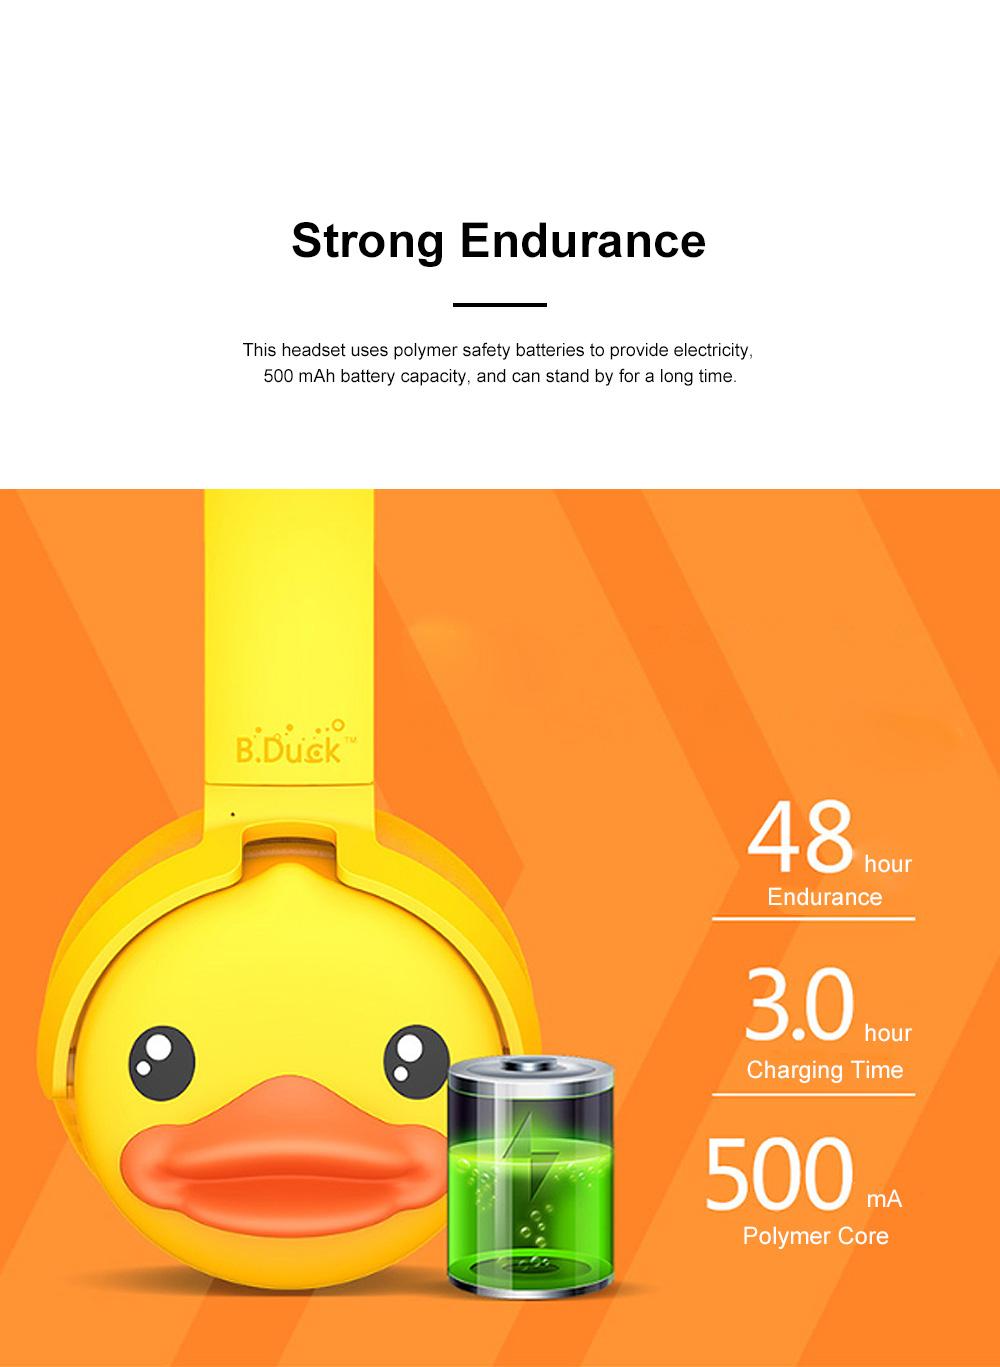 B.Duck Bluetooth Headphones Wireless Headset for Women Men Mobile Noise Reduction Sports Headphones Music Stereo 11